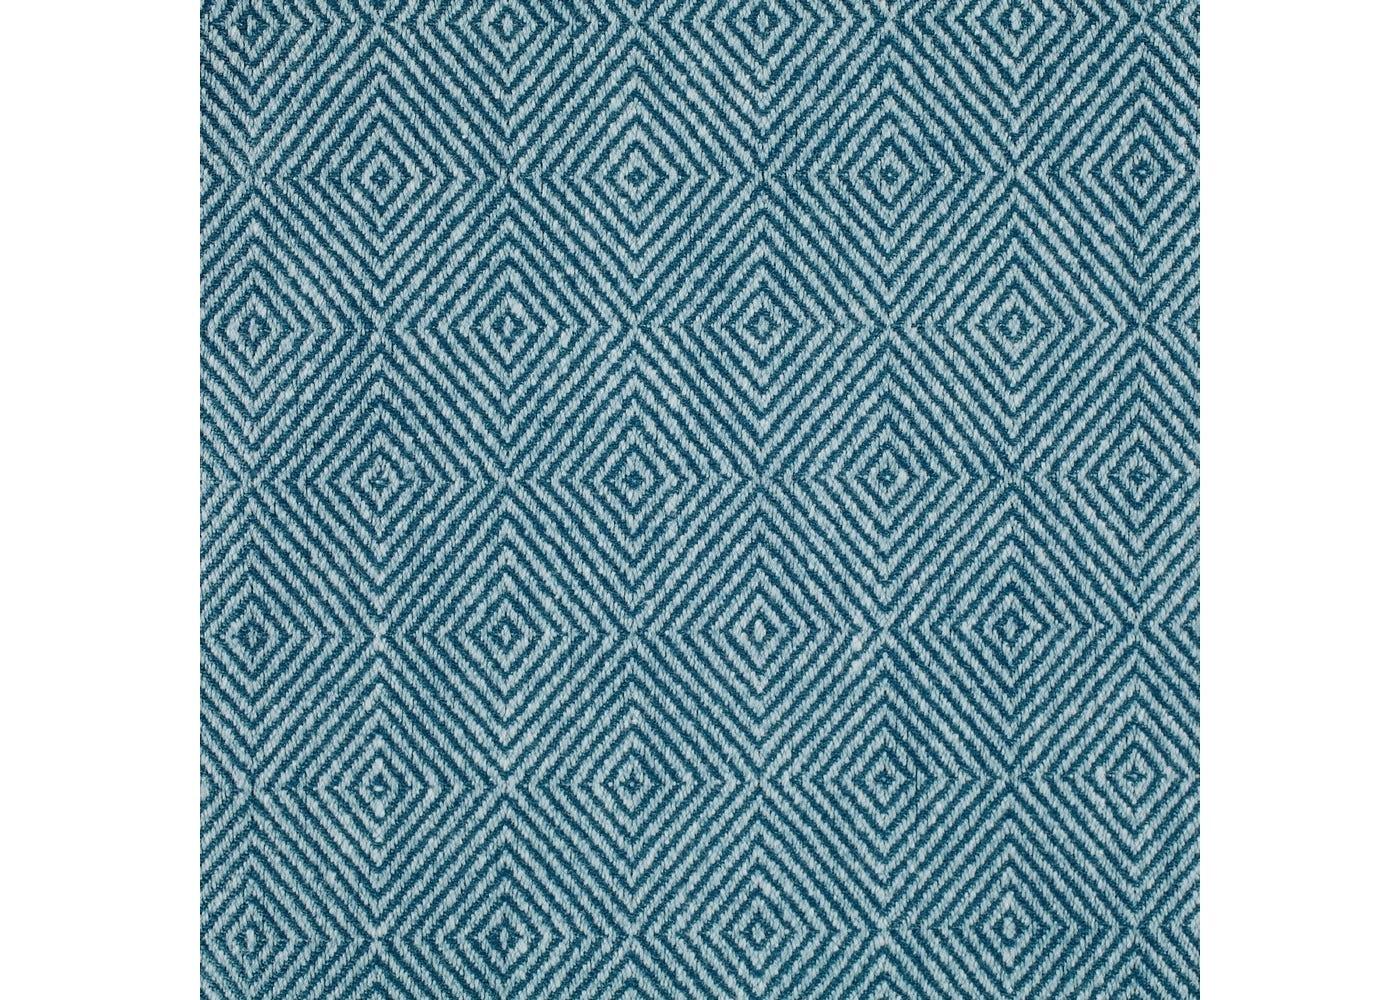 Cape plain petrol fabric